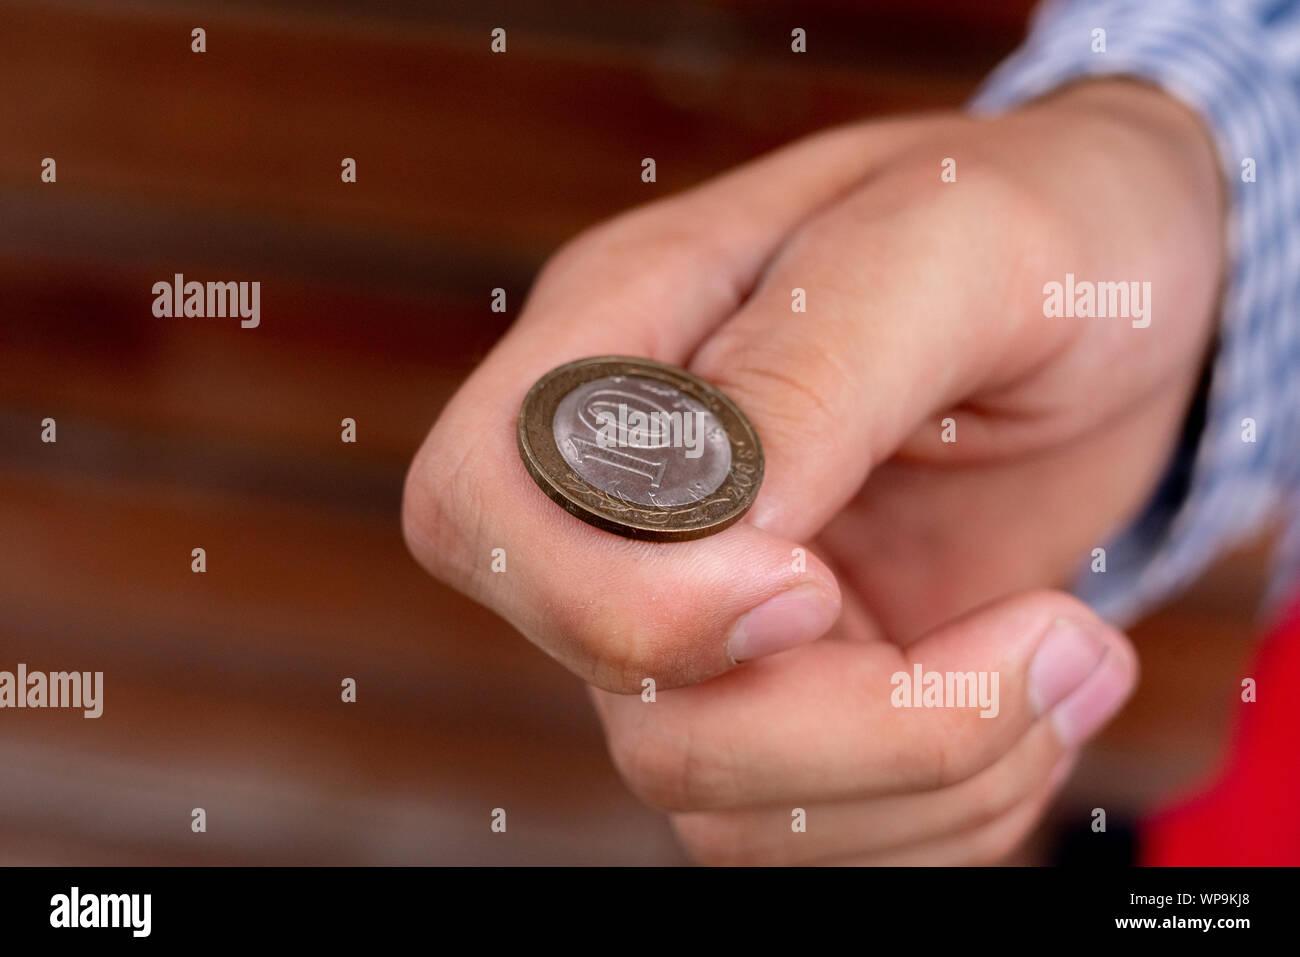 Toss A Coin Stock Photos & Toss A Coin Stock Images - Alamy